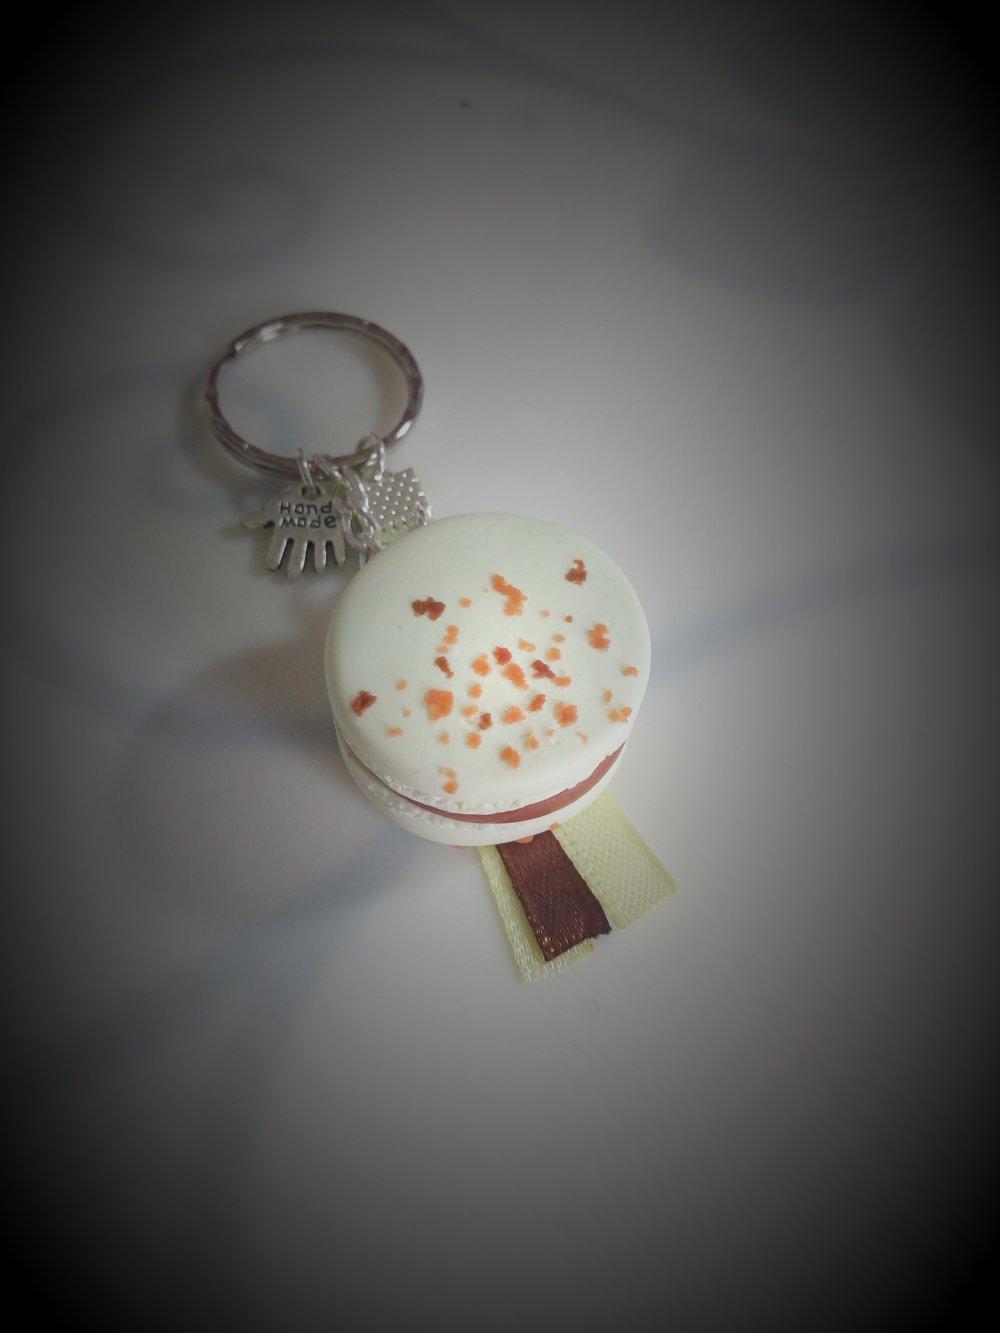 Porte clés macaron caramel